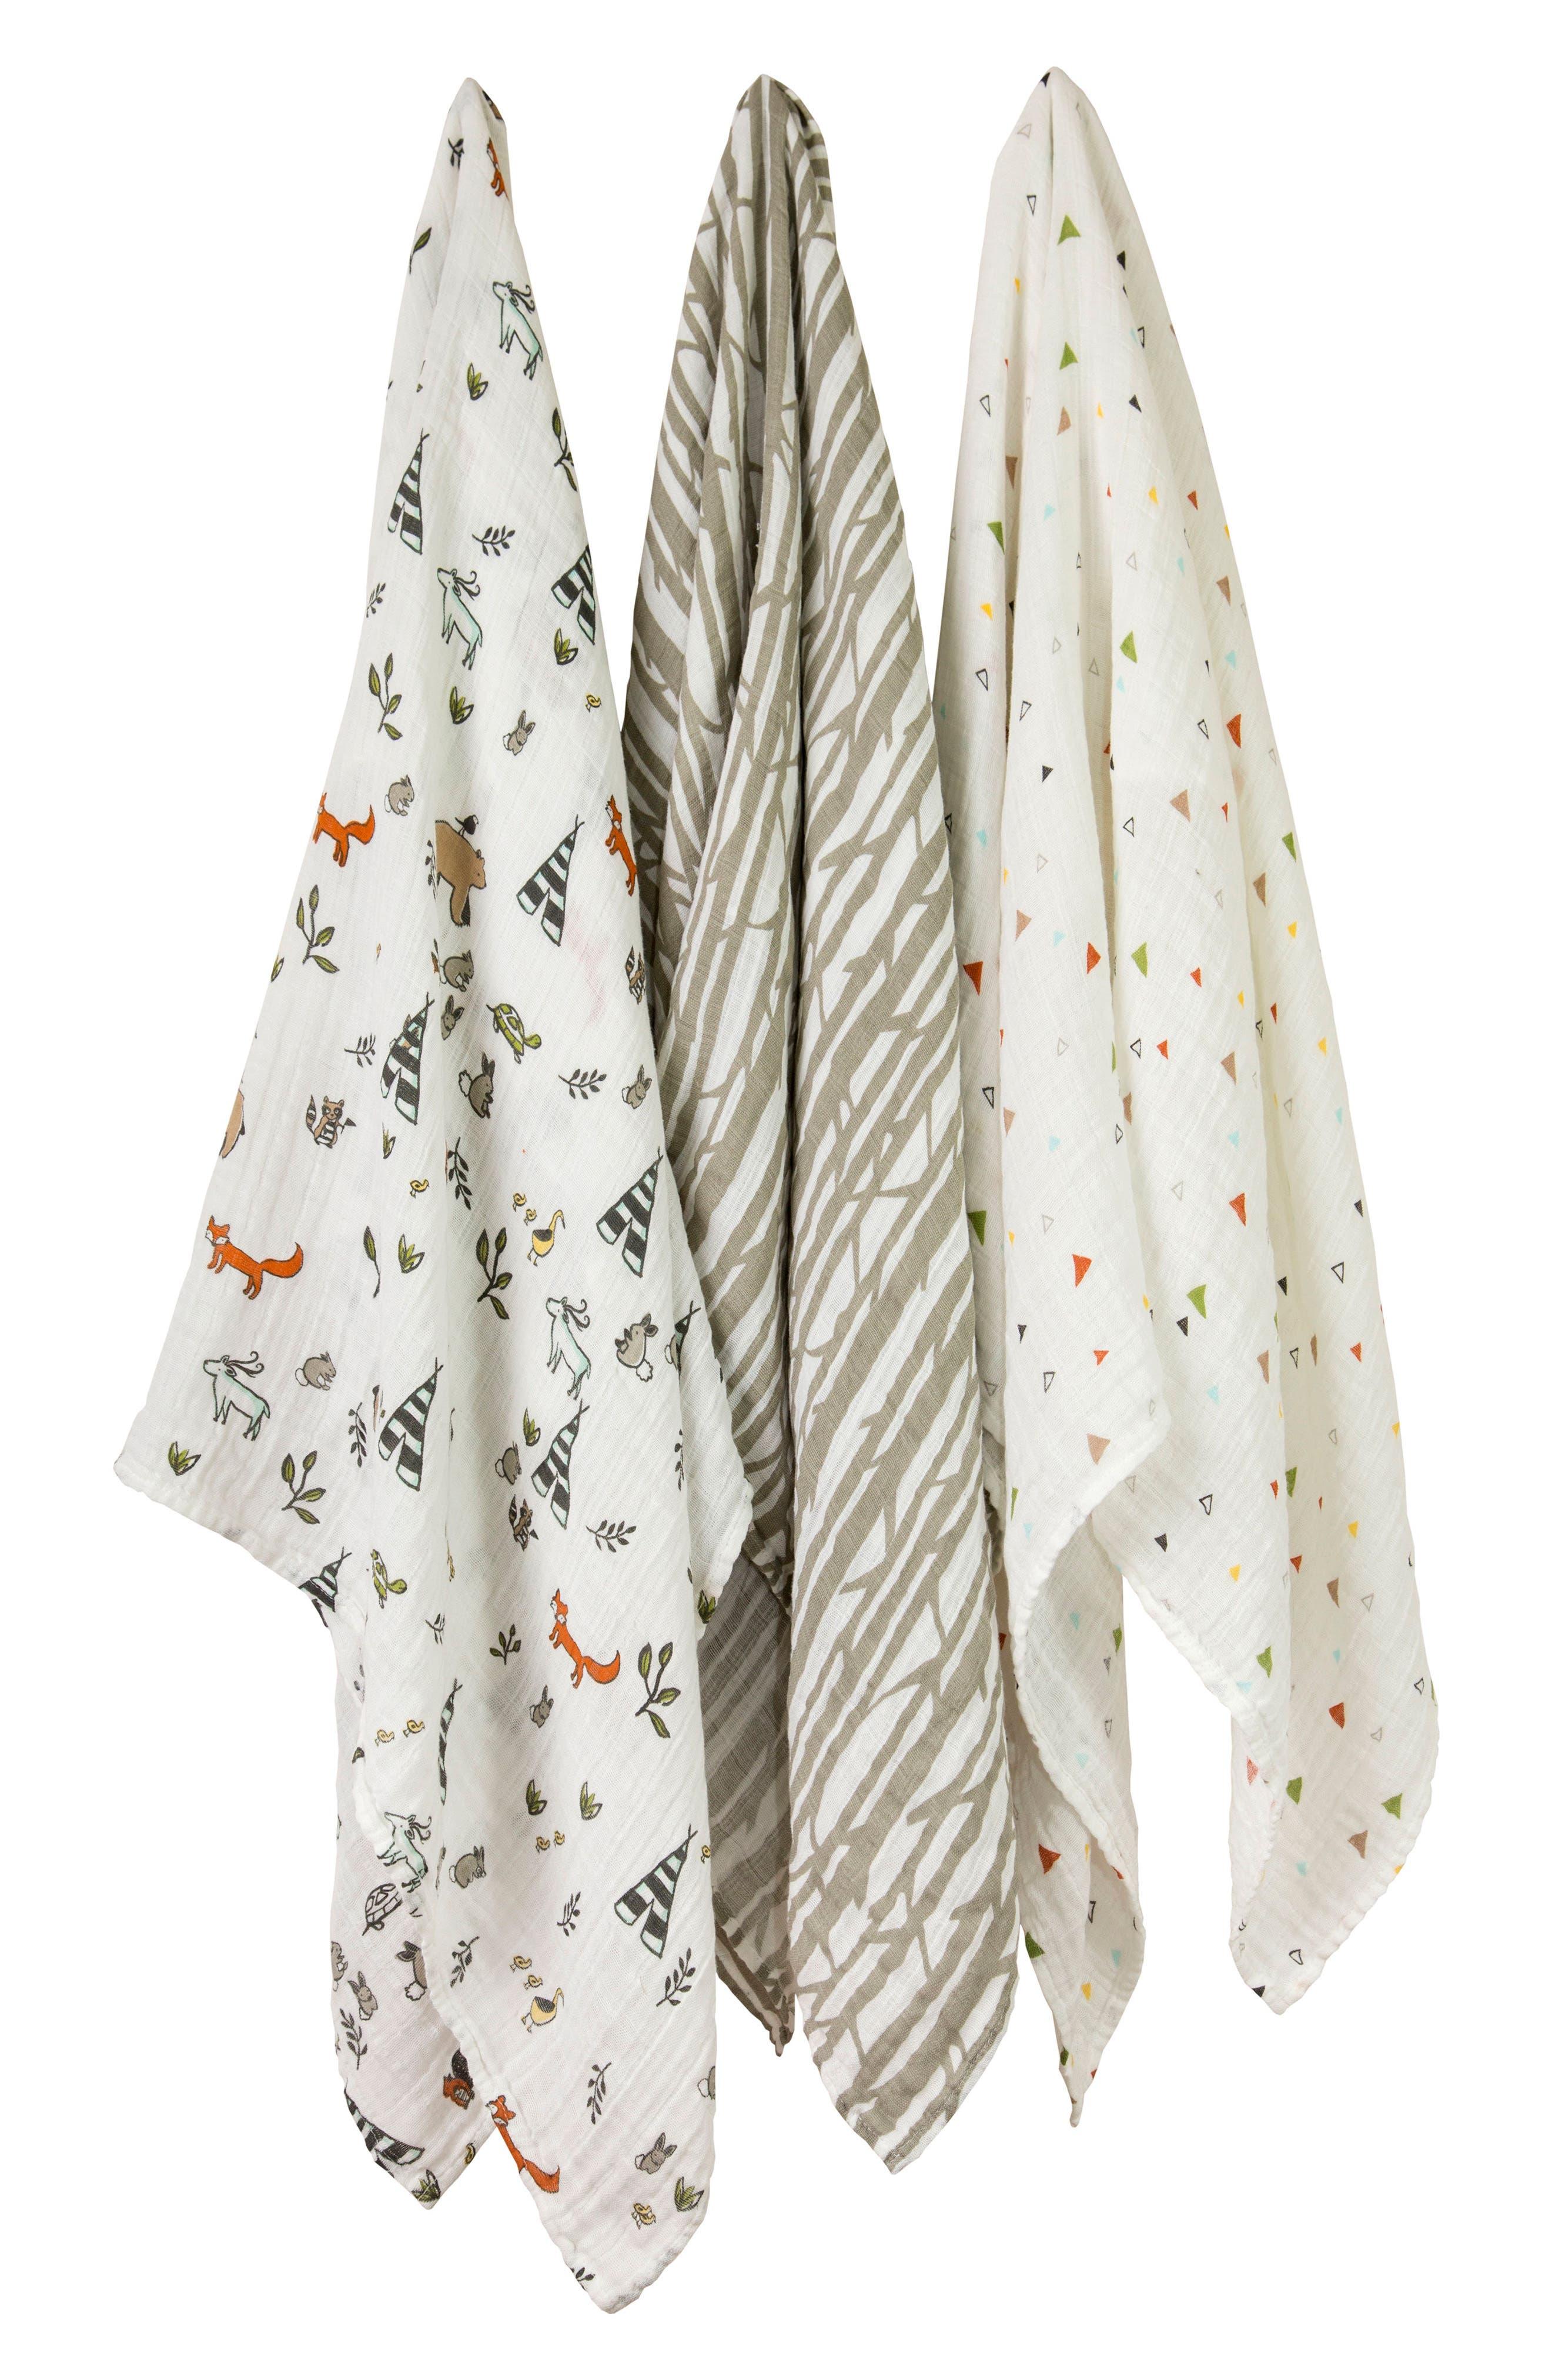 LITTLE UNICORN 3-Pack Cotton Muslin Blankets, Main, color, FOREST FRIENDS